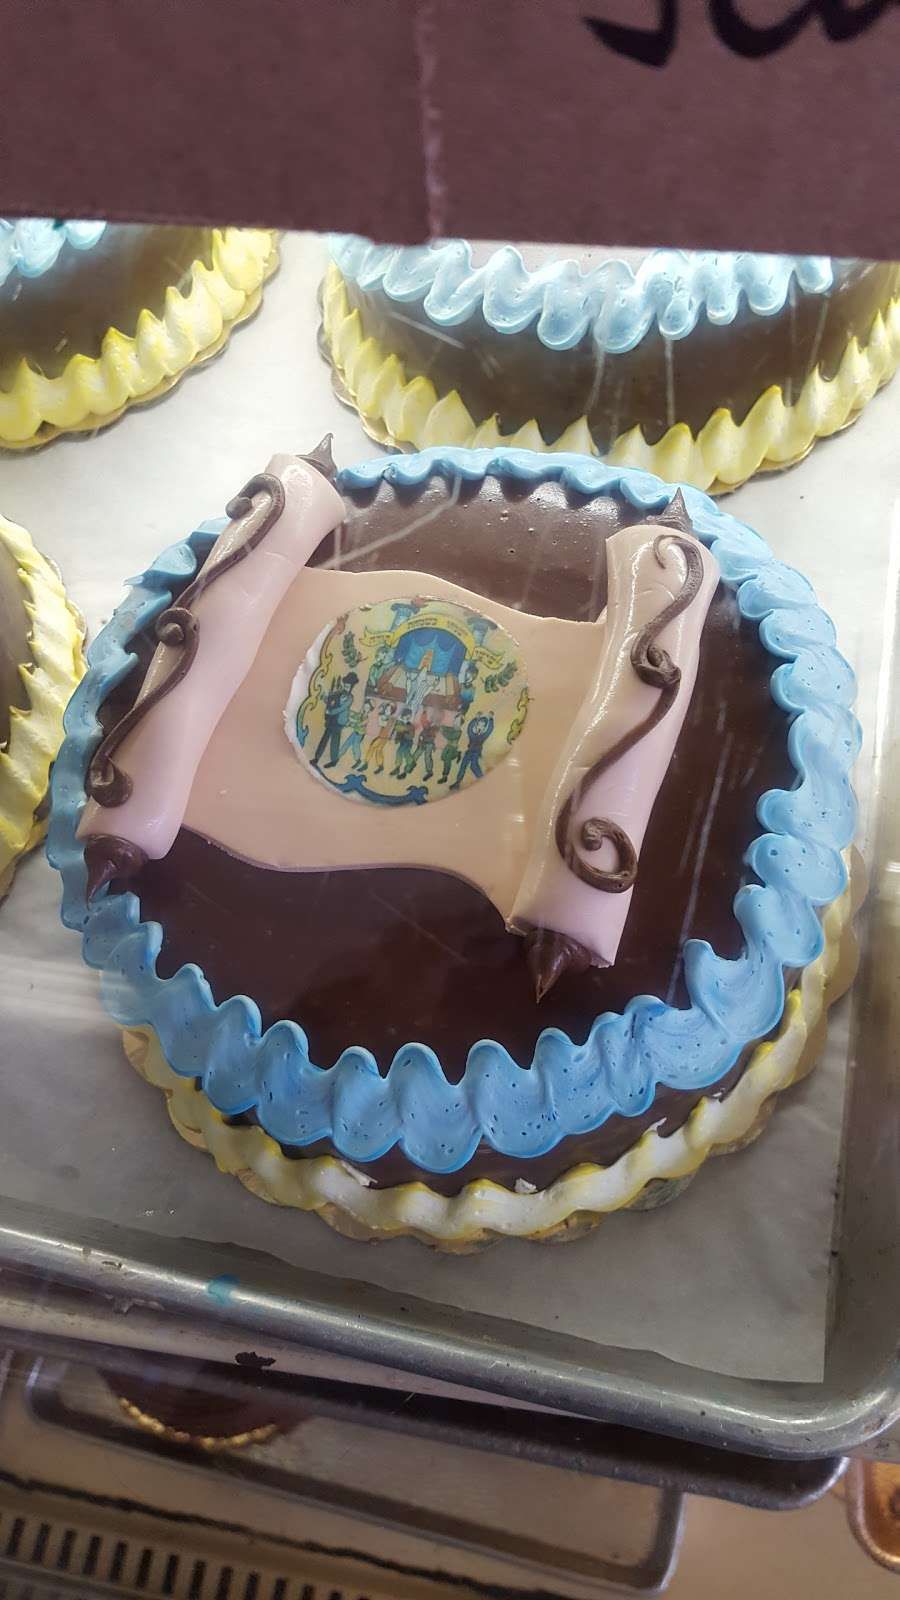 Butterflake Bakeshop - bakery  | Photo 6 of 10 | Address: 448 Cedar Ln, Teaneck, NJ 07666, USA | Phone: (201) 836-3516